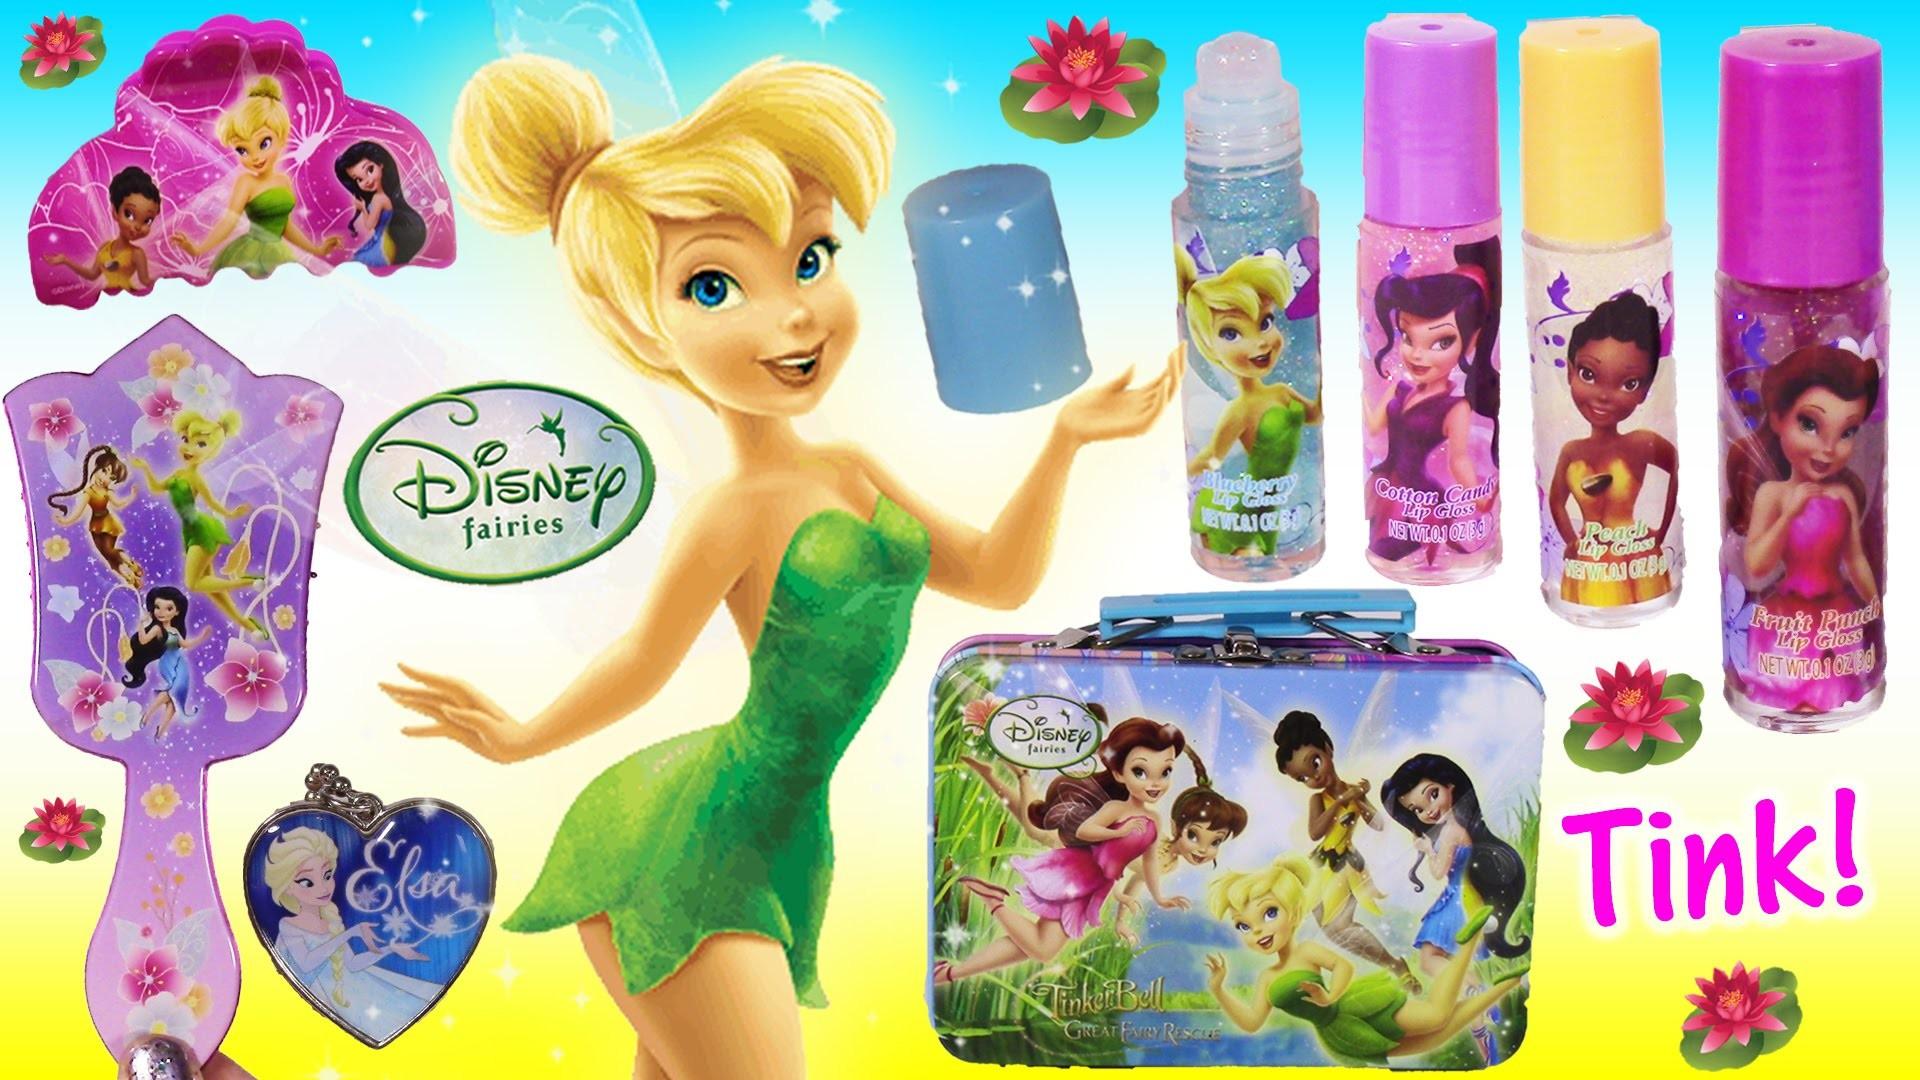 Disney Fairies Tinkerbell Hair Set! Brush Fairy Hair Extensions Clips! LIP  GLOSS! FROZEN Elsa! FUN – YouTube